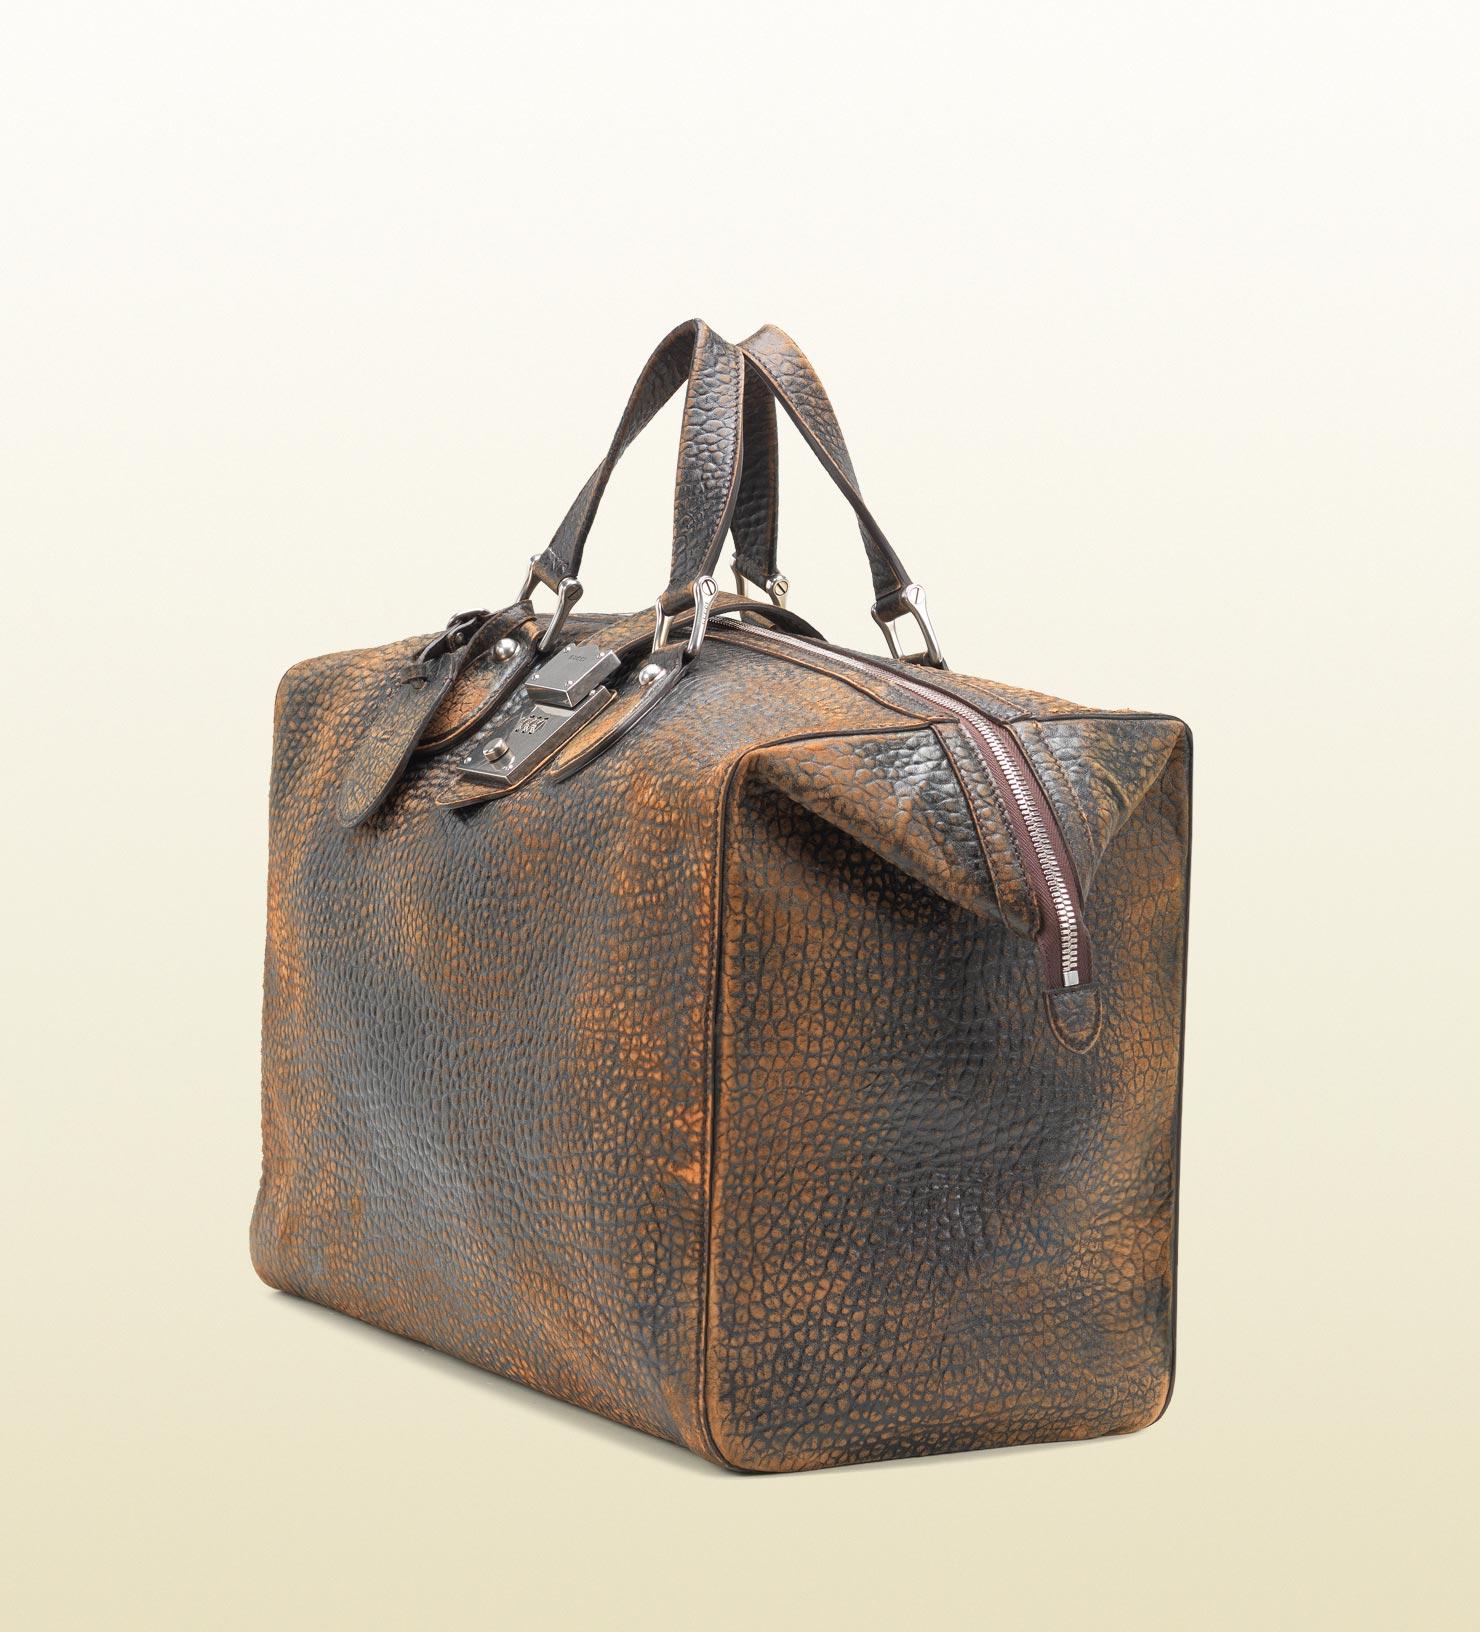 Gucci Gucci men goldmark grainy leather duffle bag Men39s bags 0b7592791f